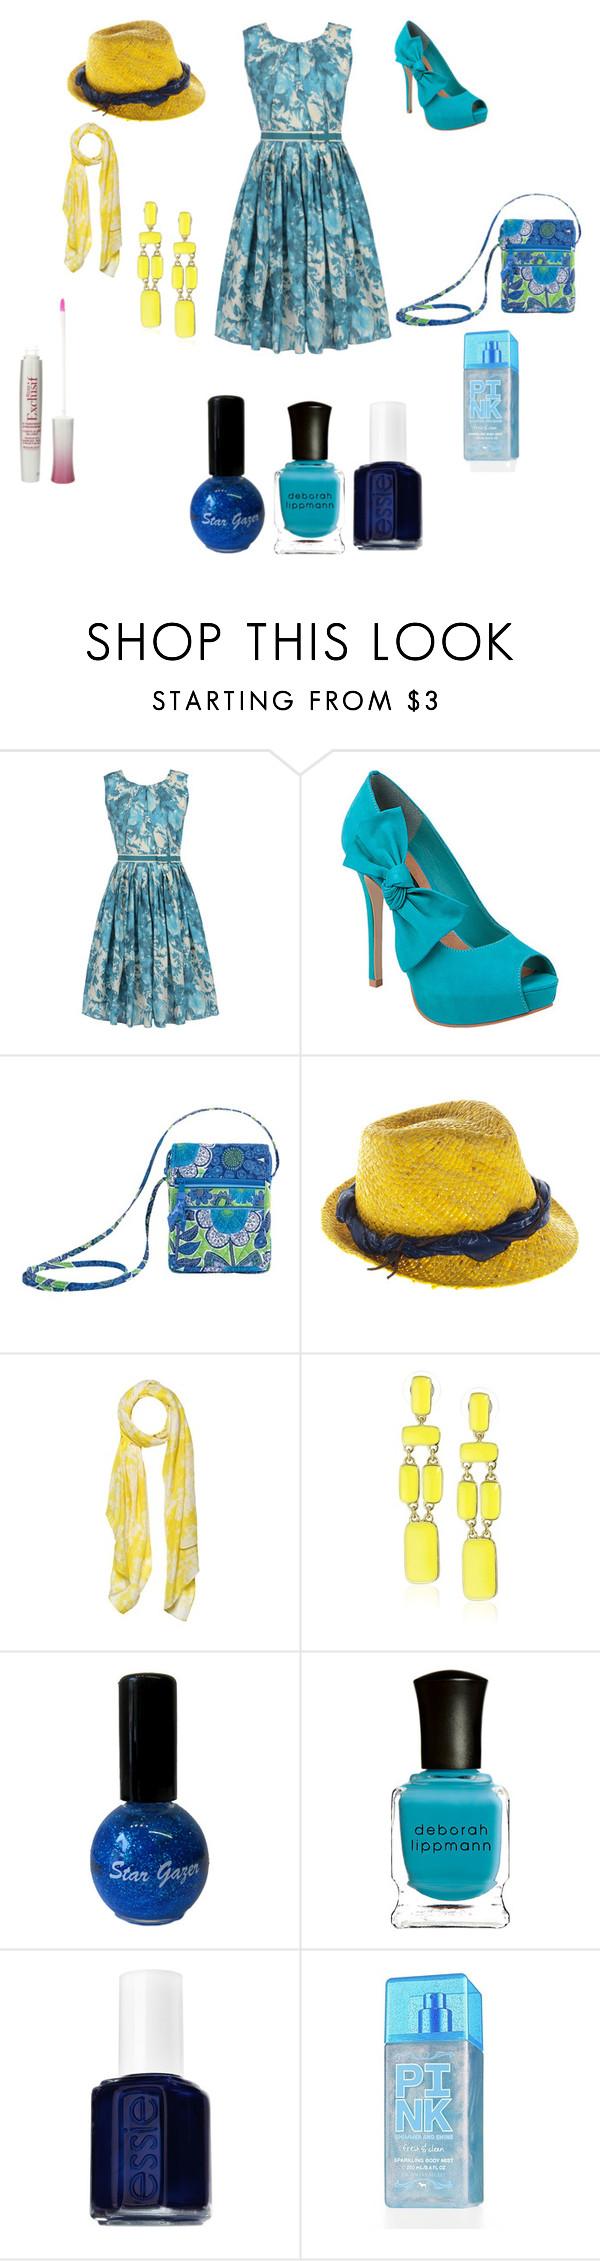 """blue is cool!!"" by raejaejae ❤ liked on Polyvore featuring Antonio Marras, Steve Madden, Vera Bradley, HTC, Crumpet, Kate Spade, Deborah Lippmann, Essie, Victoria's Secret and Bourjois"